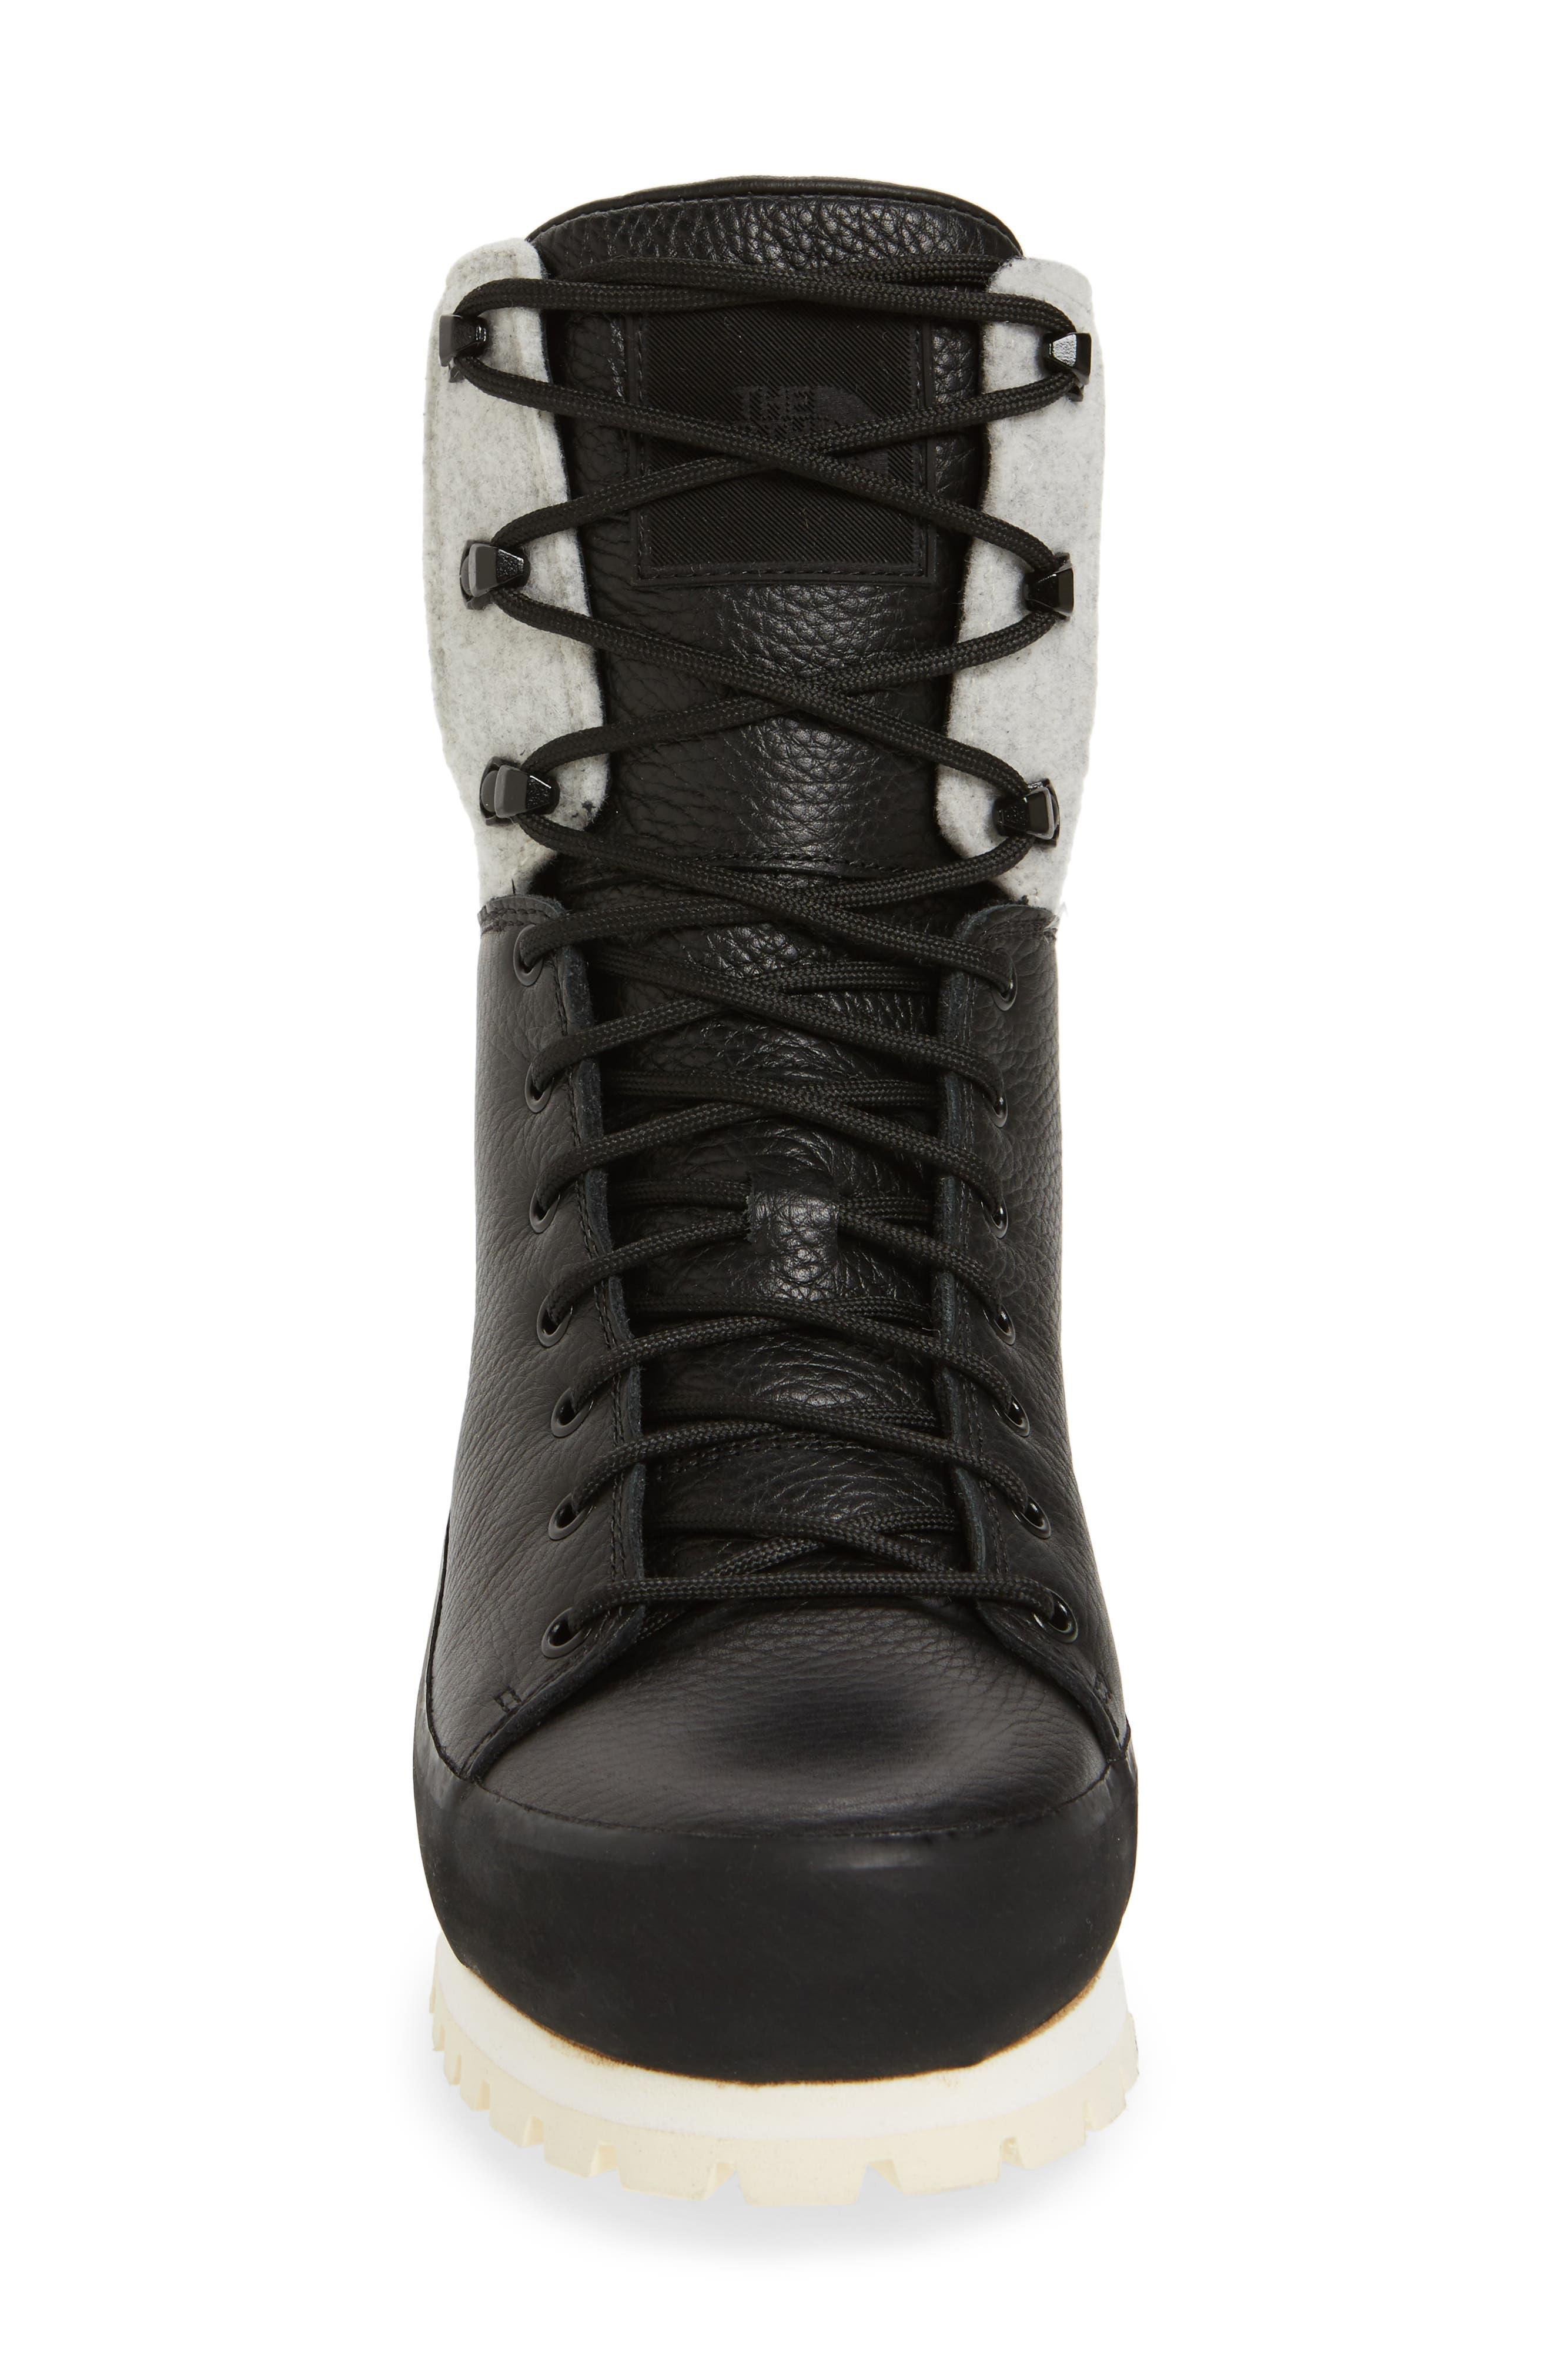 Cryos Boot,                             Alternate thumbnail 4, color,                             TNF BLACK/ GLACIER WHITE